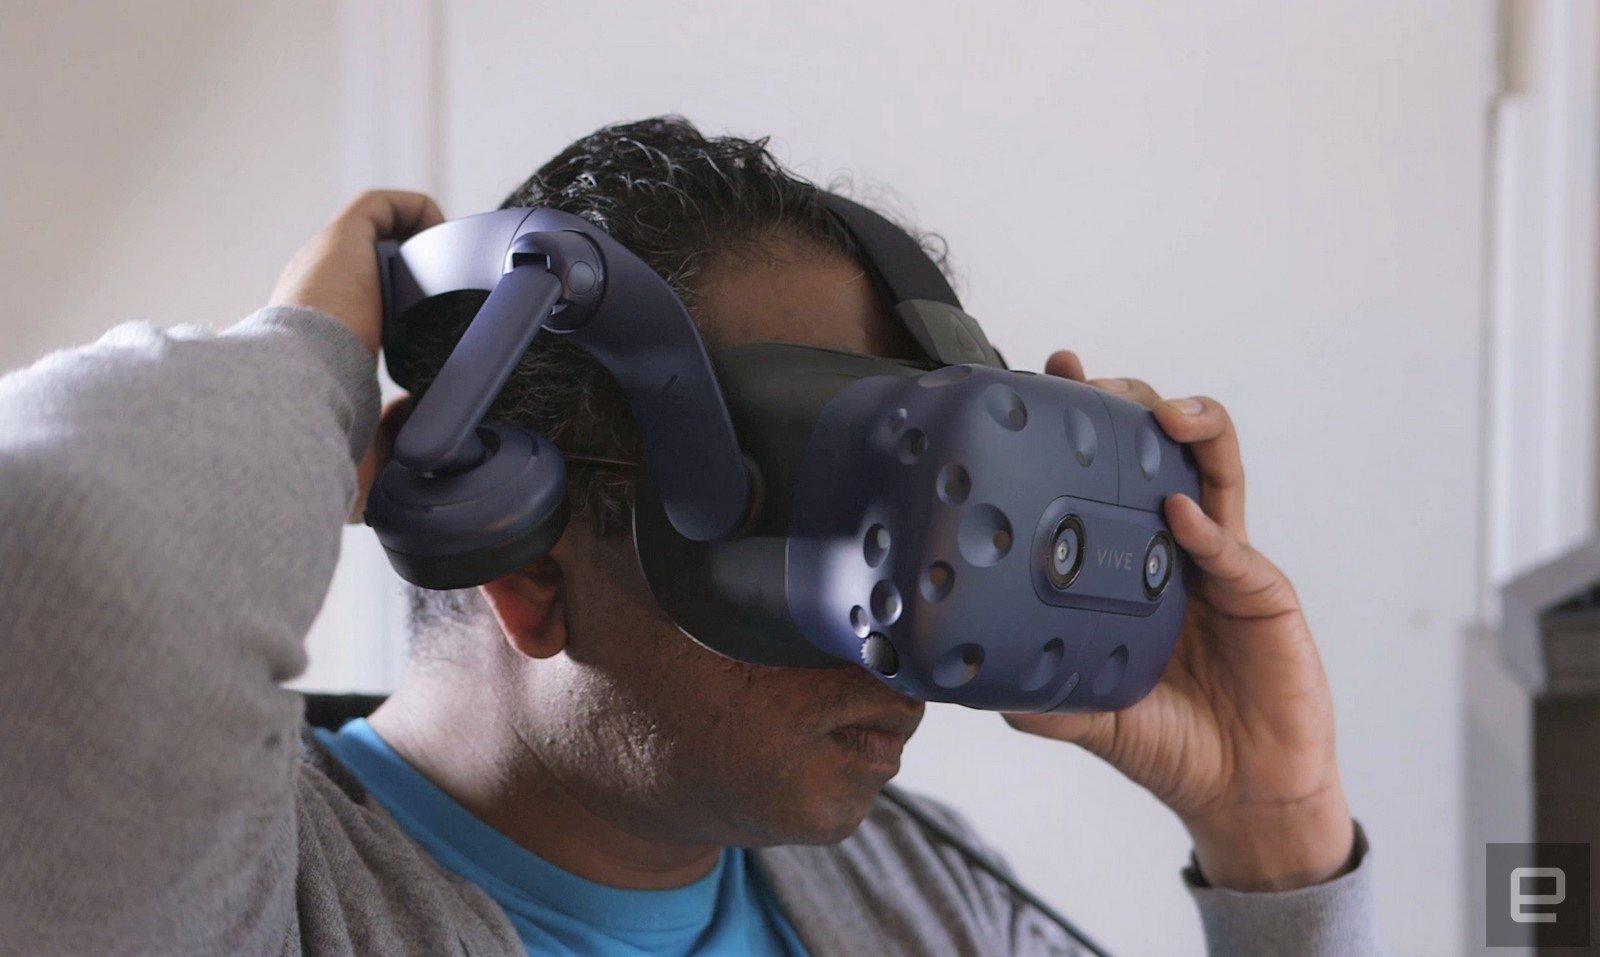 HTC Vive Pro已实现多房间追踪功能,玩VR版的密室脱逃游戏应该很不错